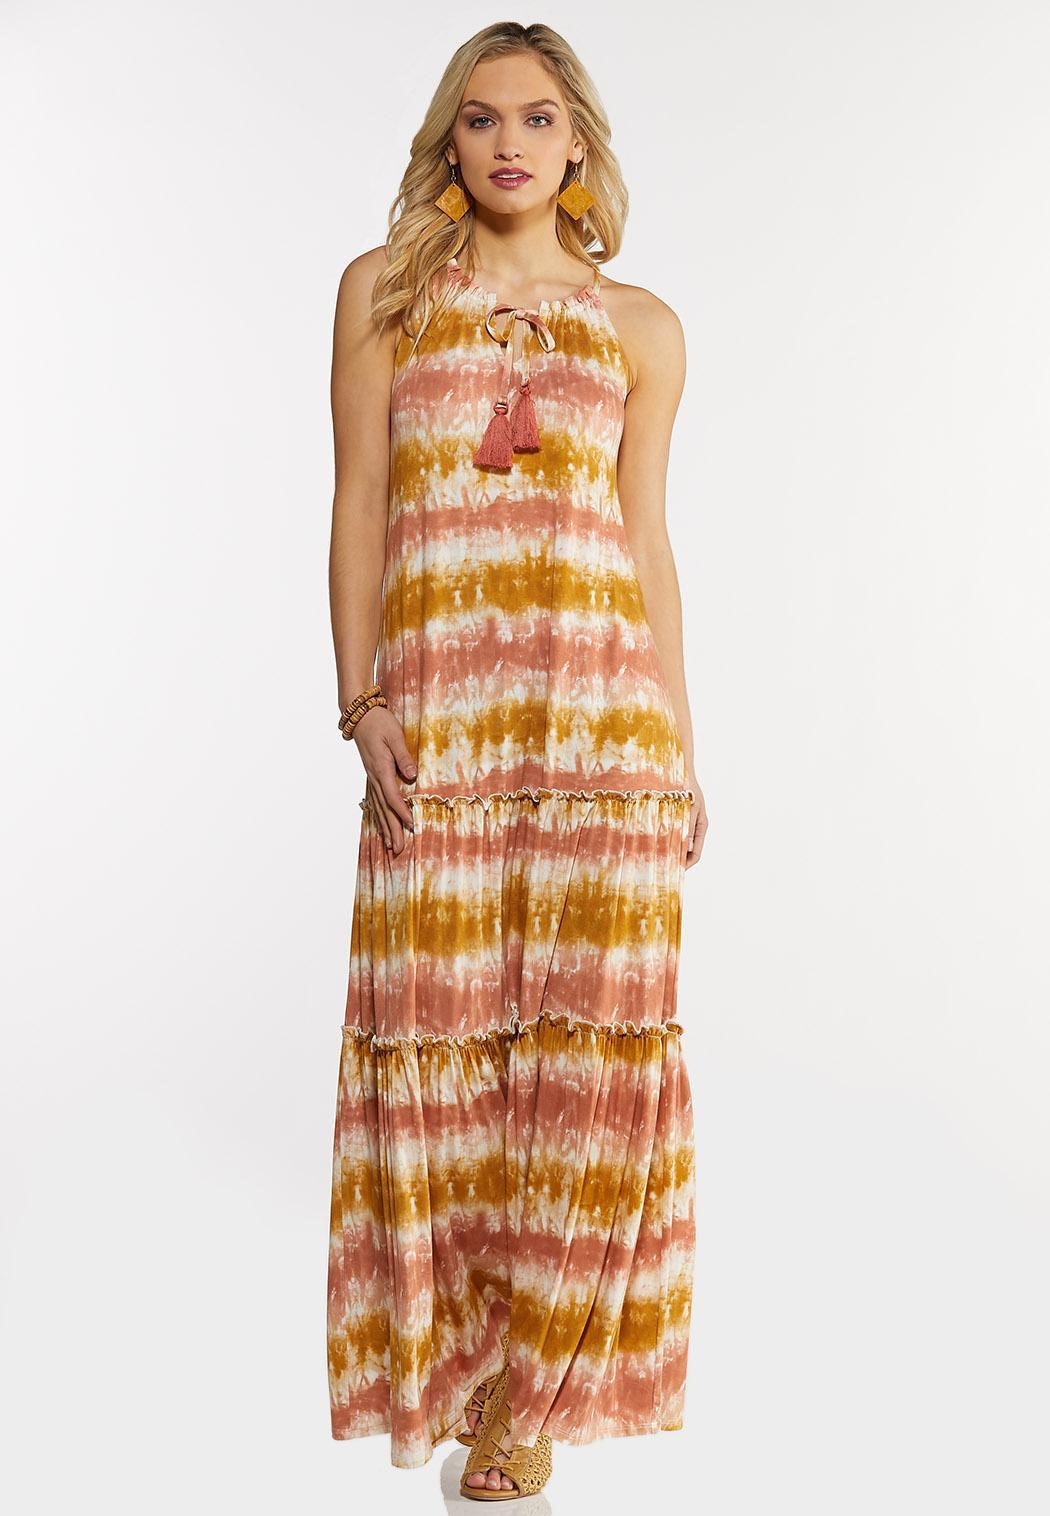 Tiered Tie Dye Maxi Dress